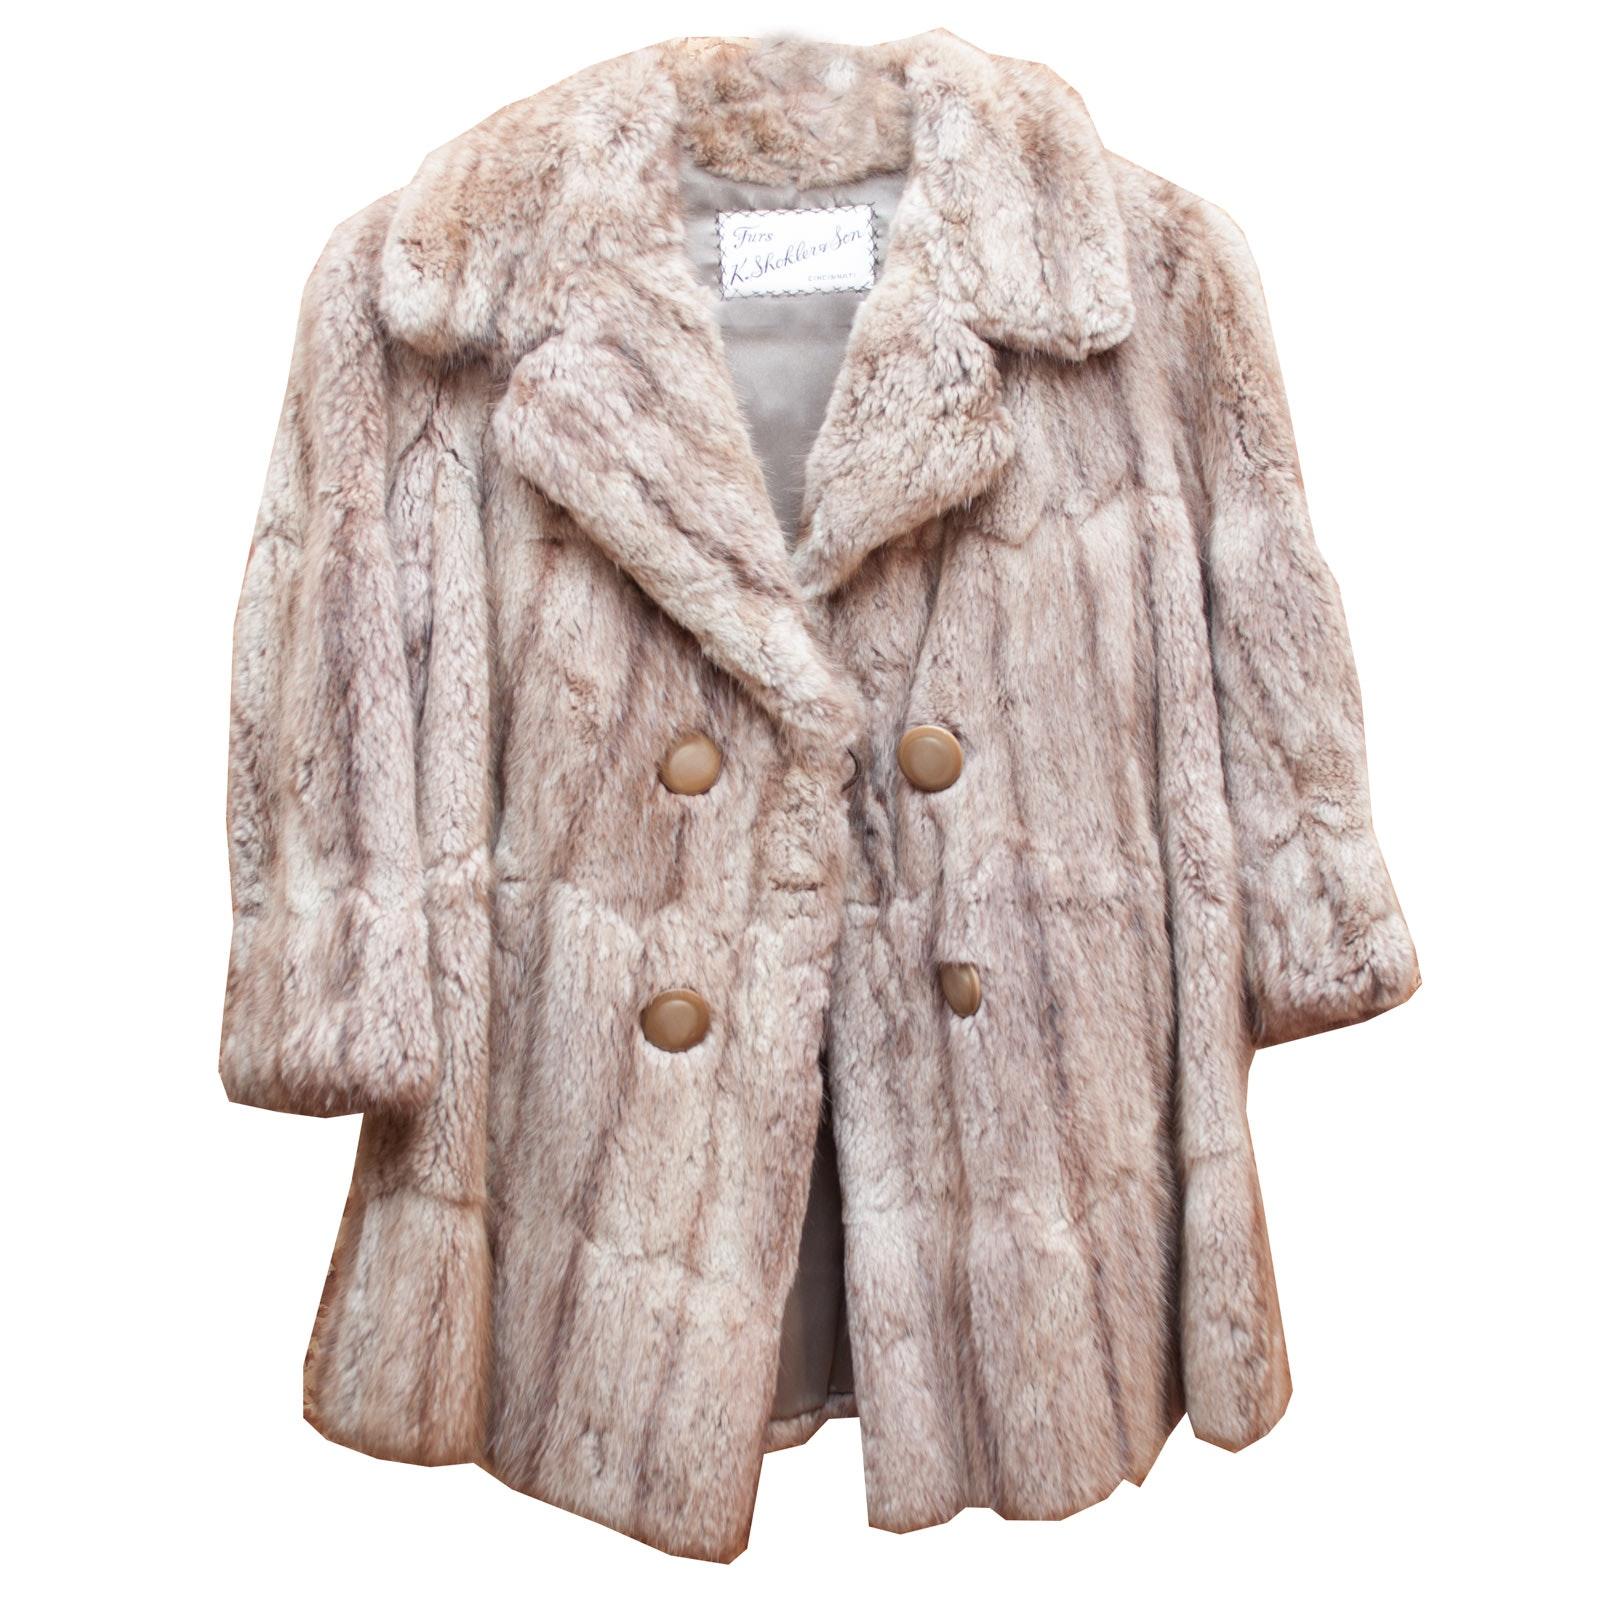 Vintage Fox Fur Coat by K. Shoklers & Son